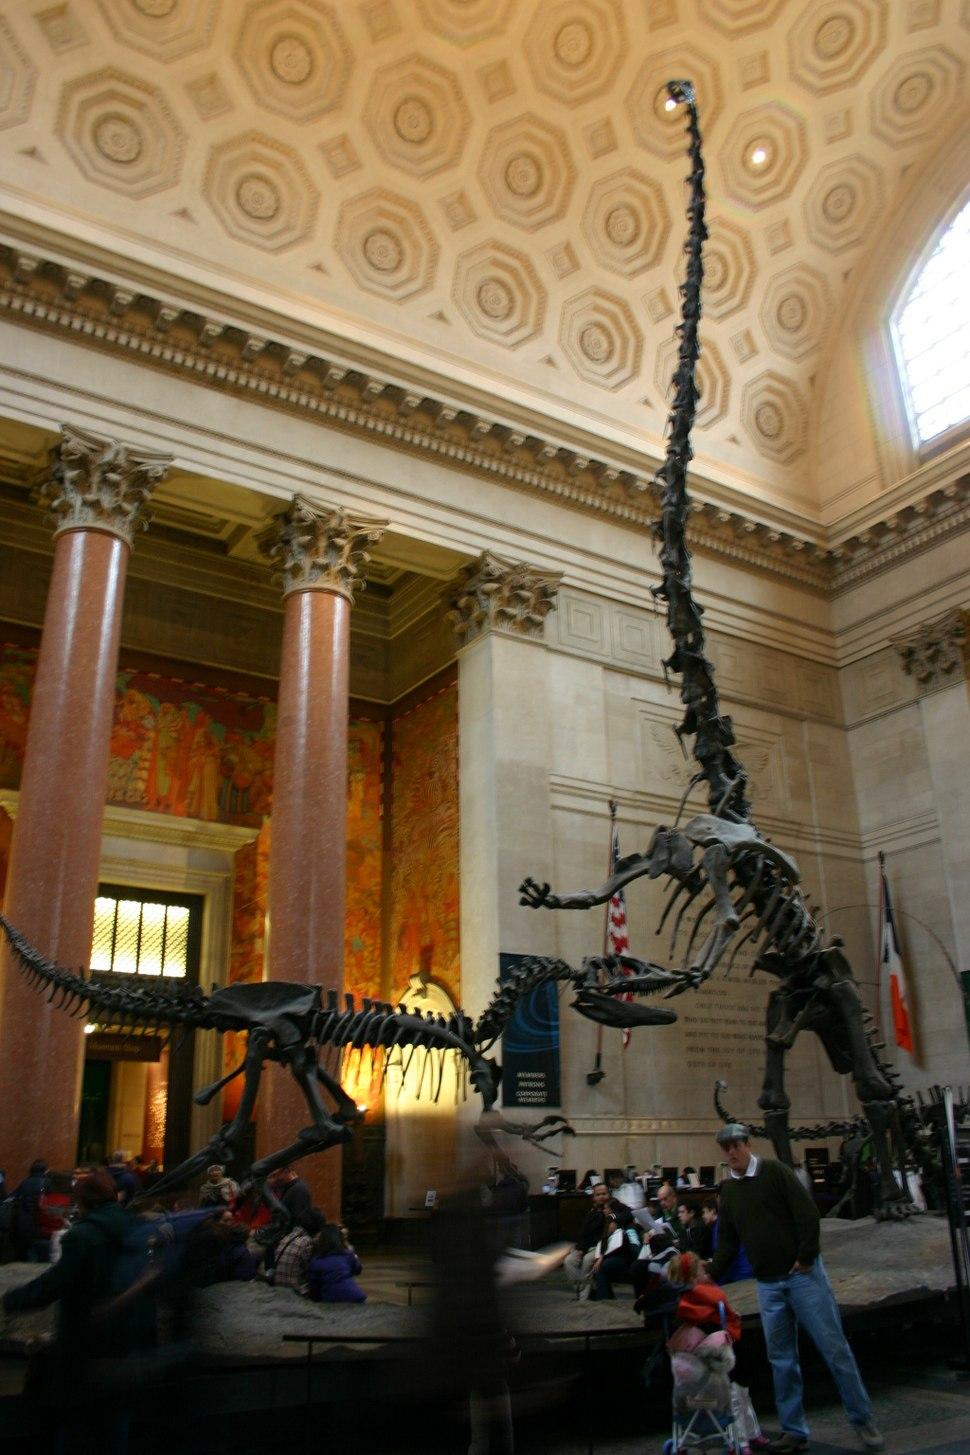 Allosaurus and Barosaurus